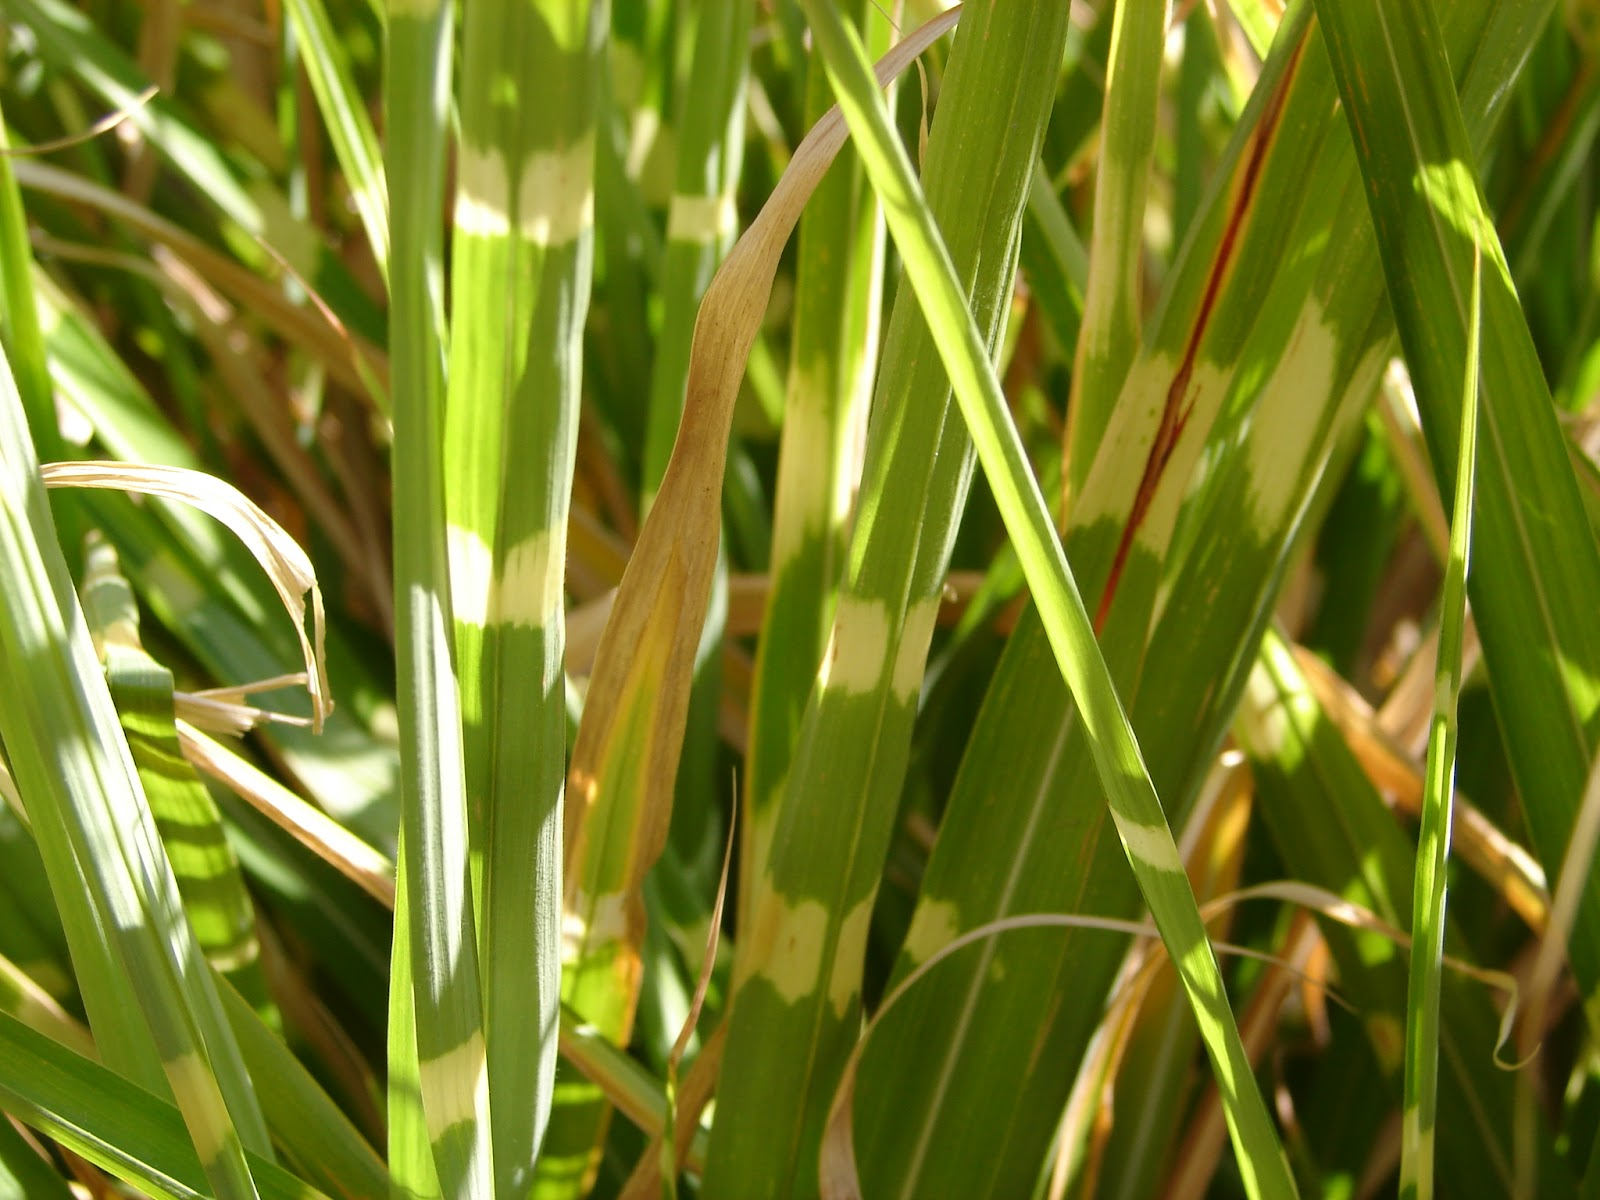 New utah gardener porcupine grass and zebra grass for Tall green ornamental grass